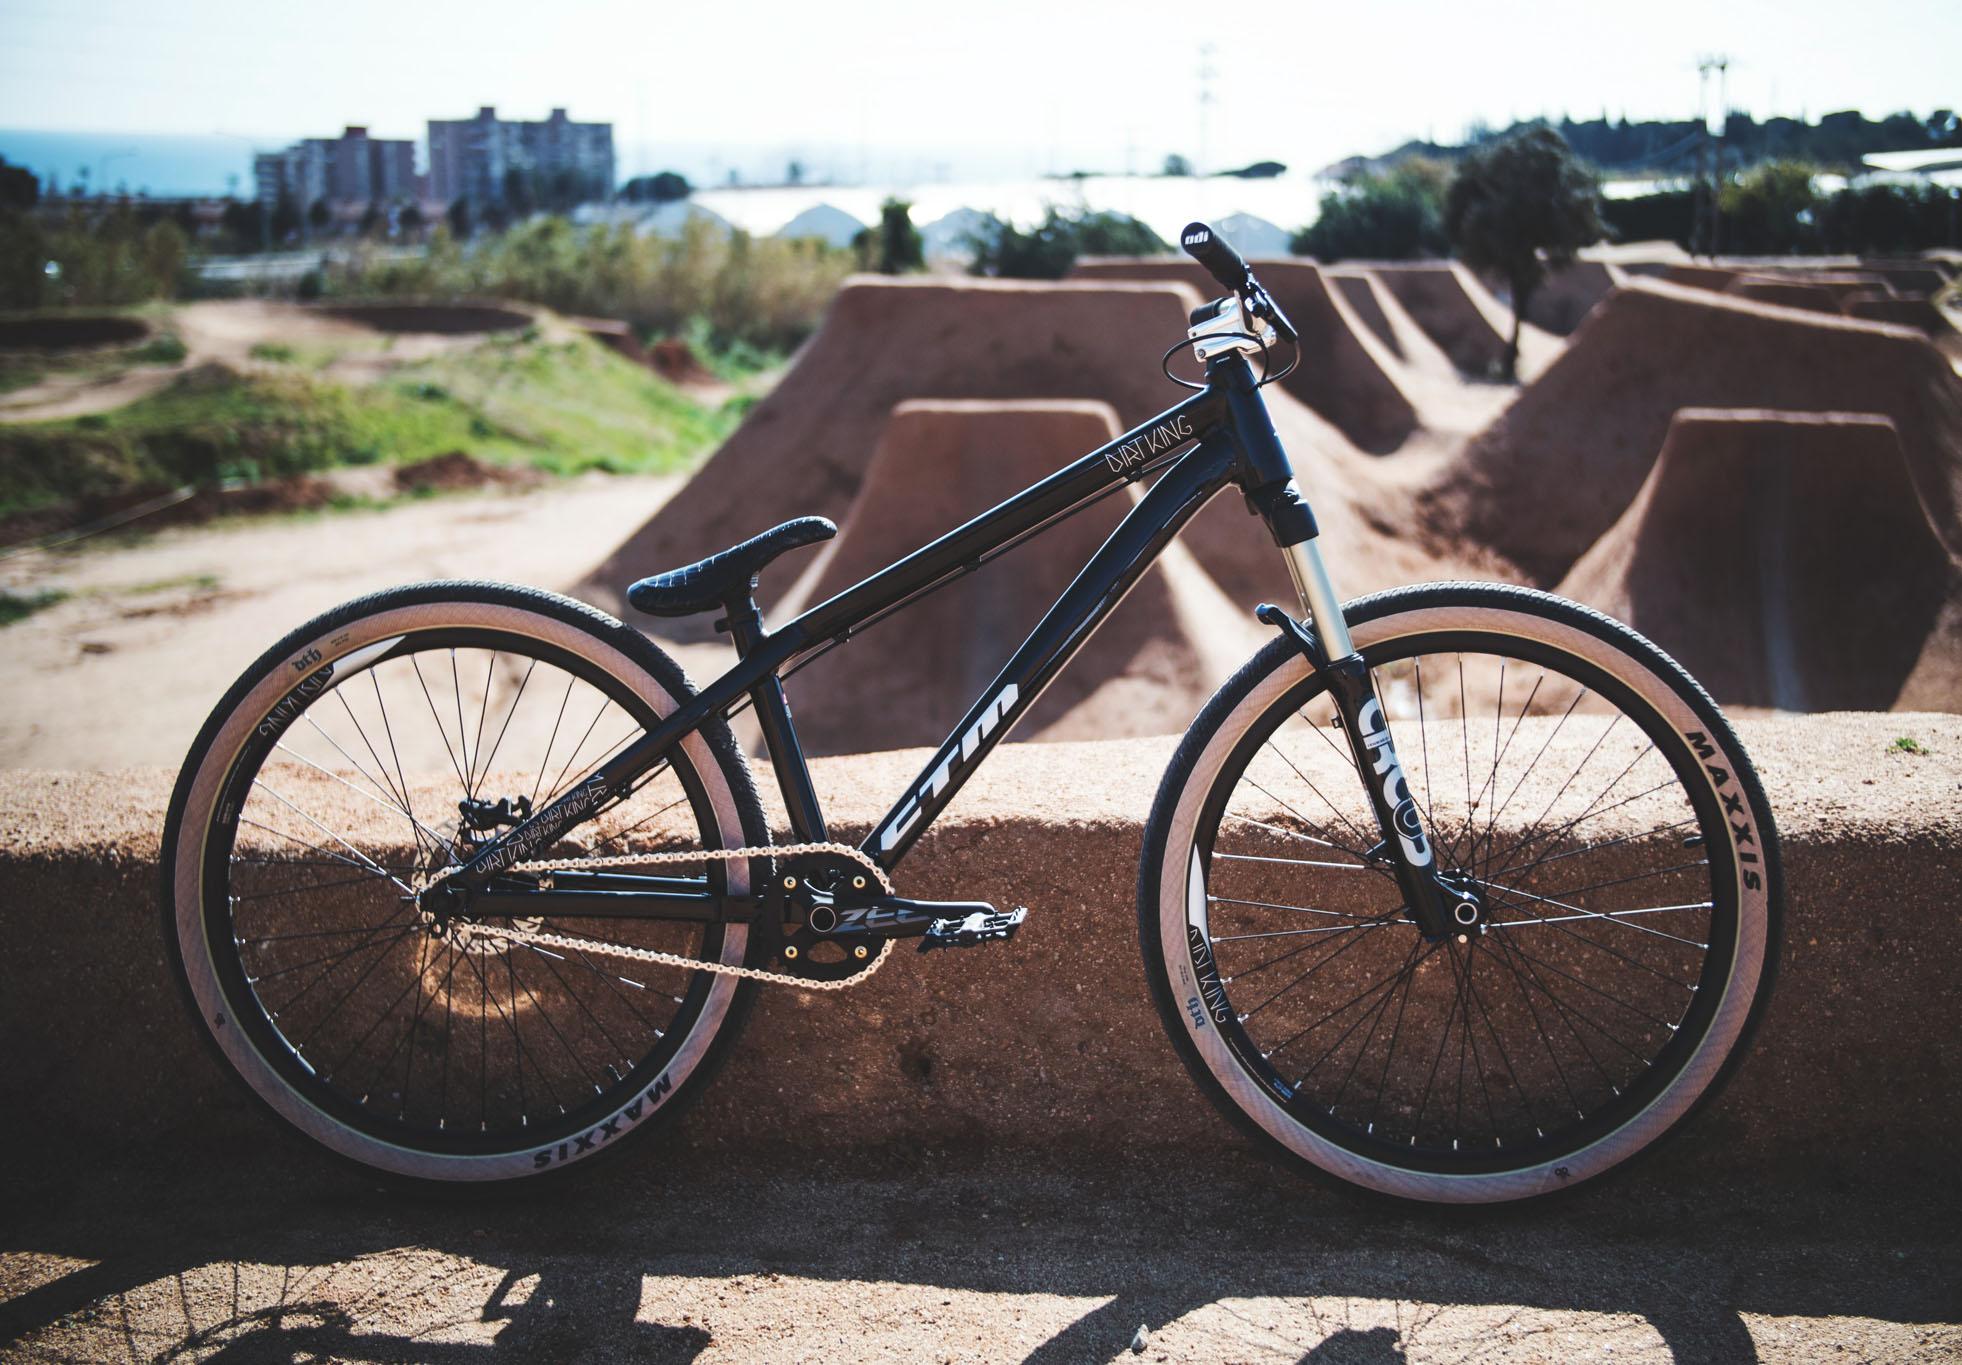 Bike-check: Roman Pichnarcik i CTM Dirtking PRO